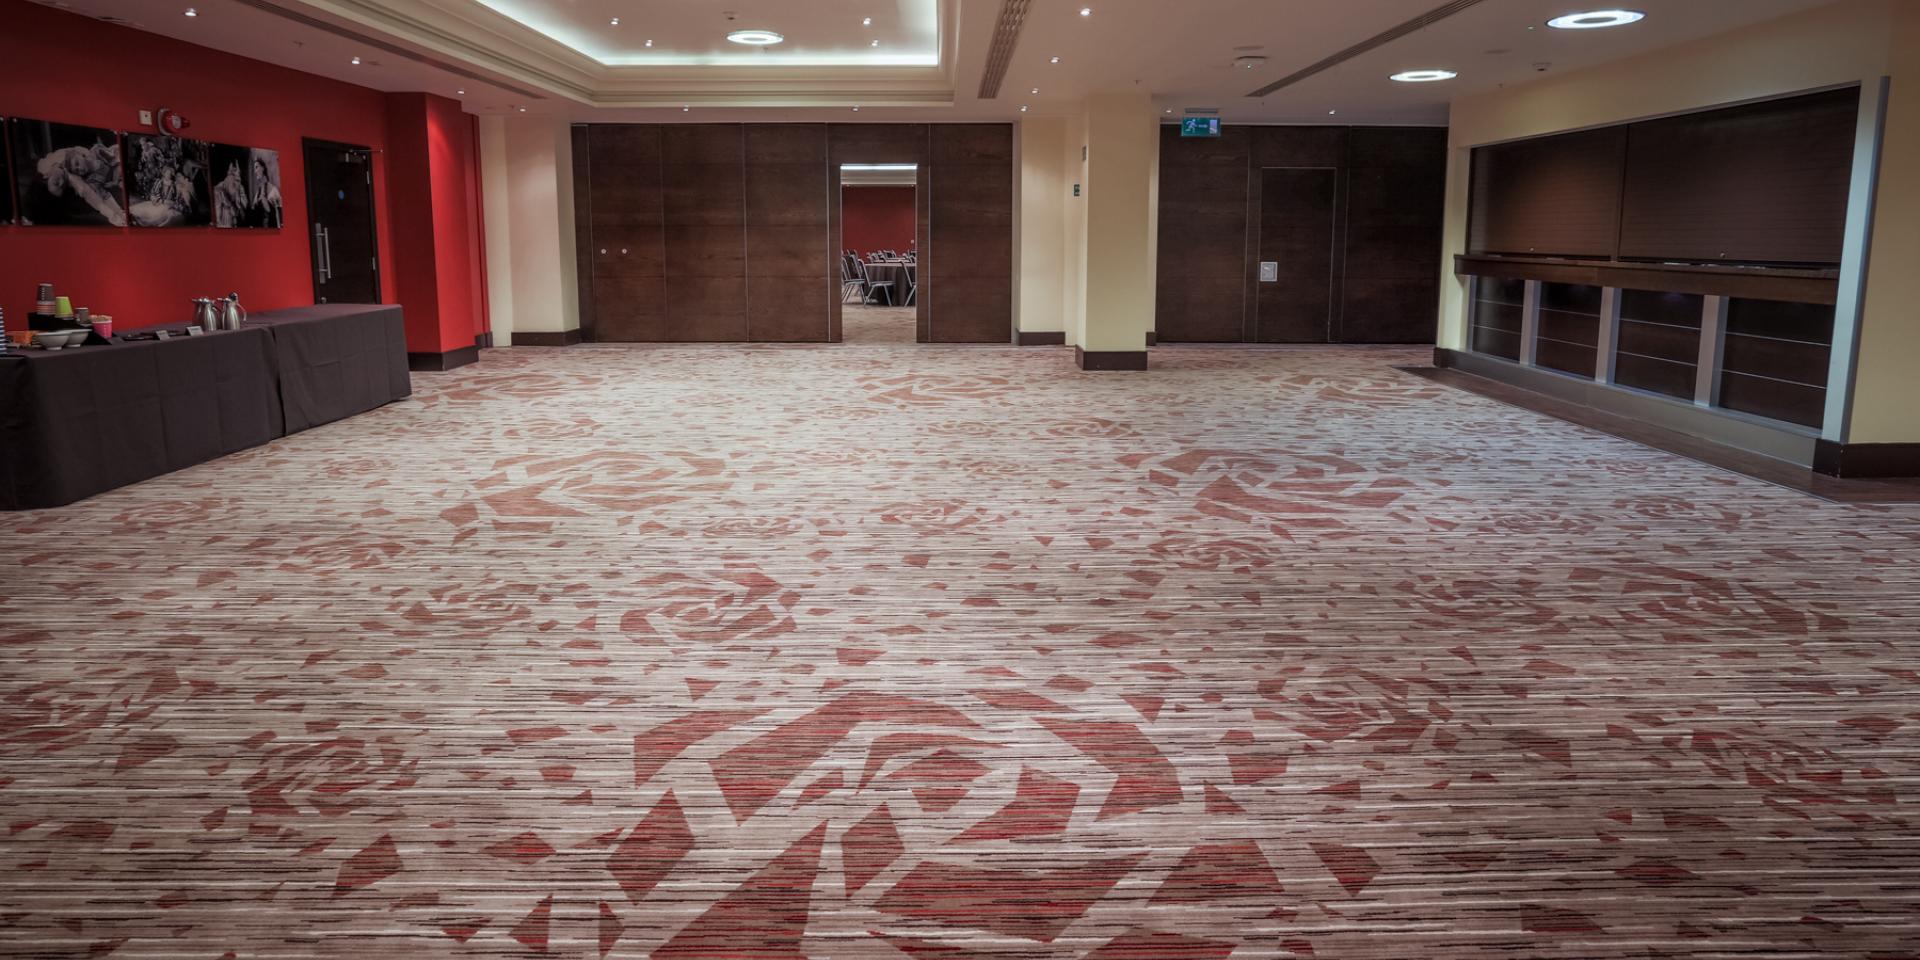 Axminster Carpets at Twickenham Stadium